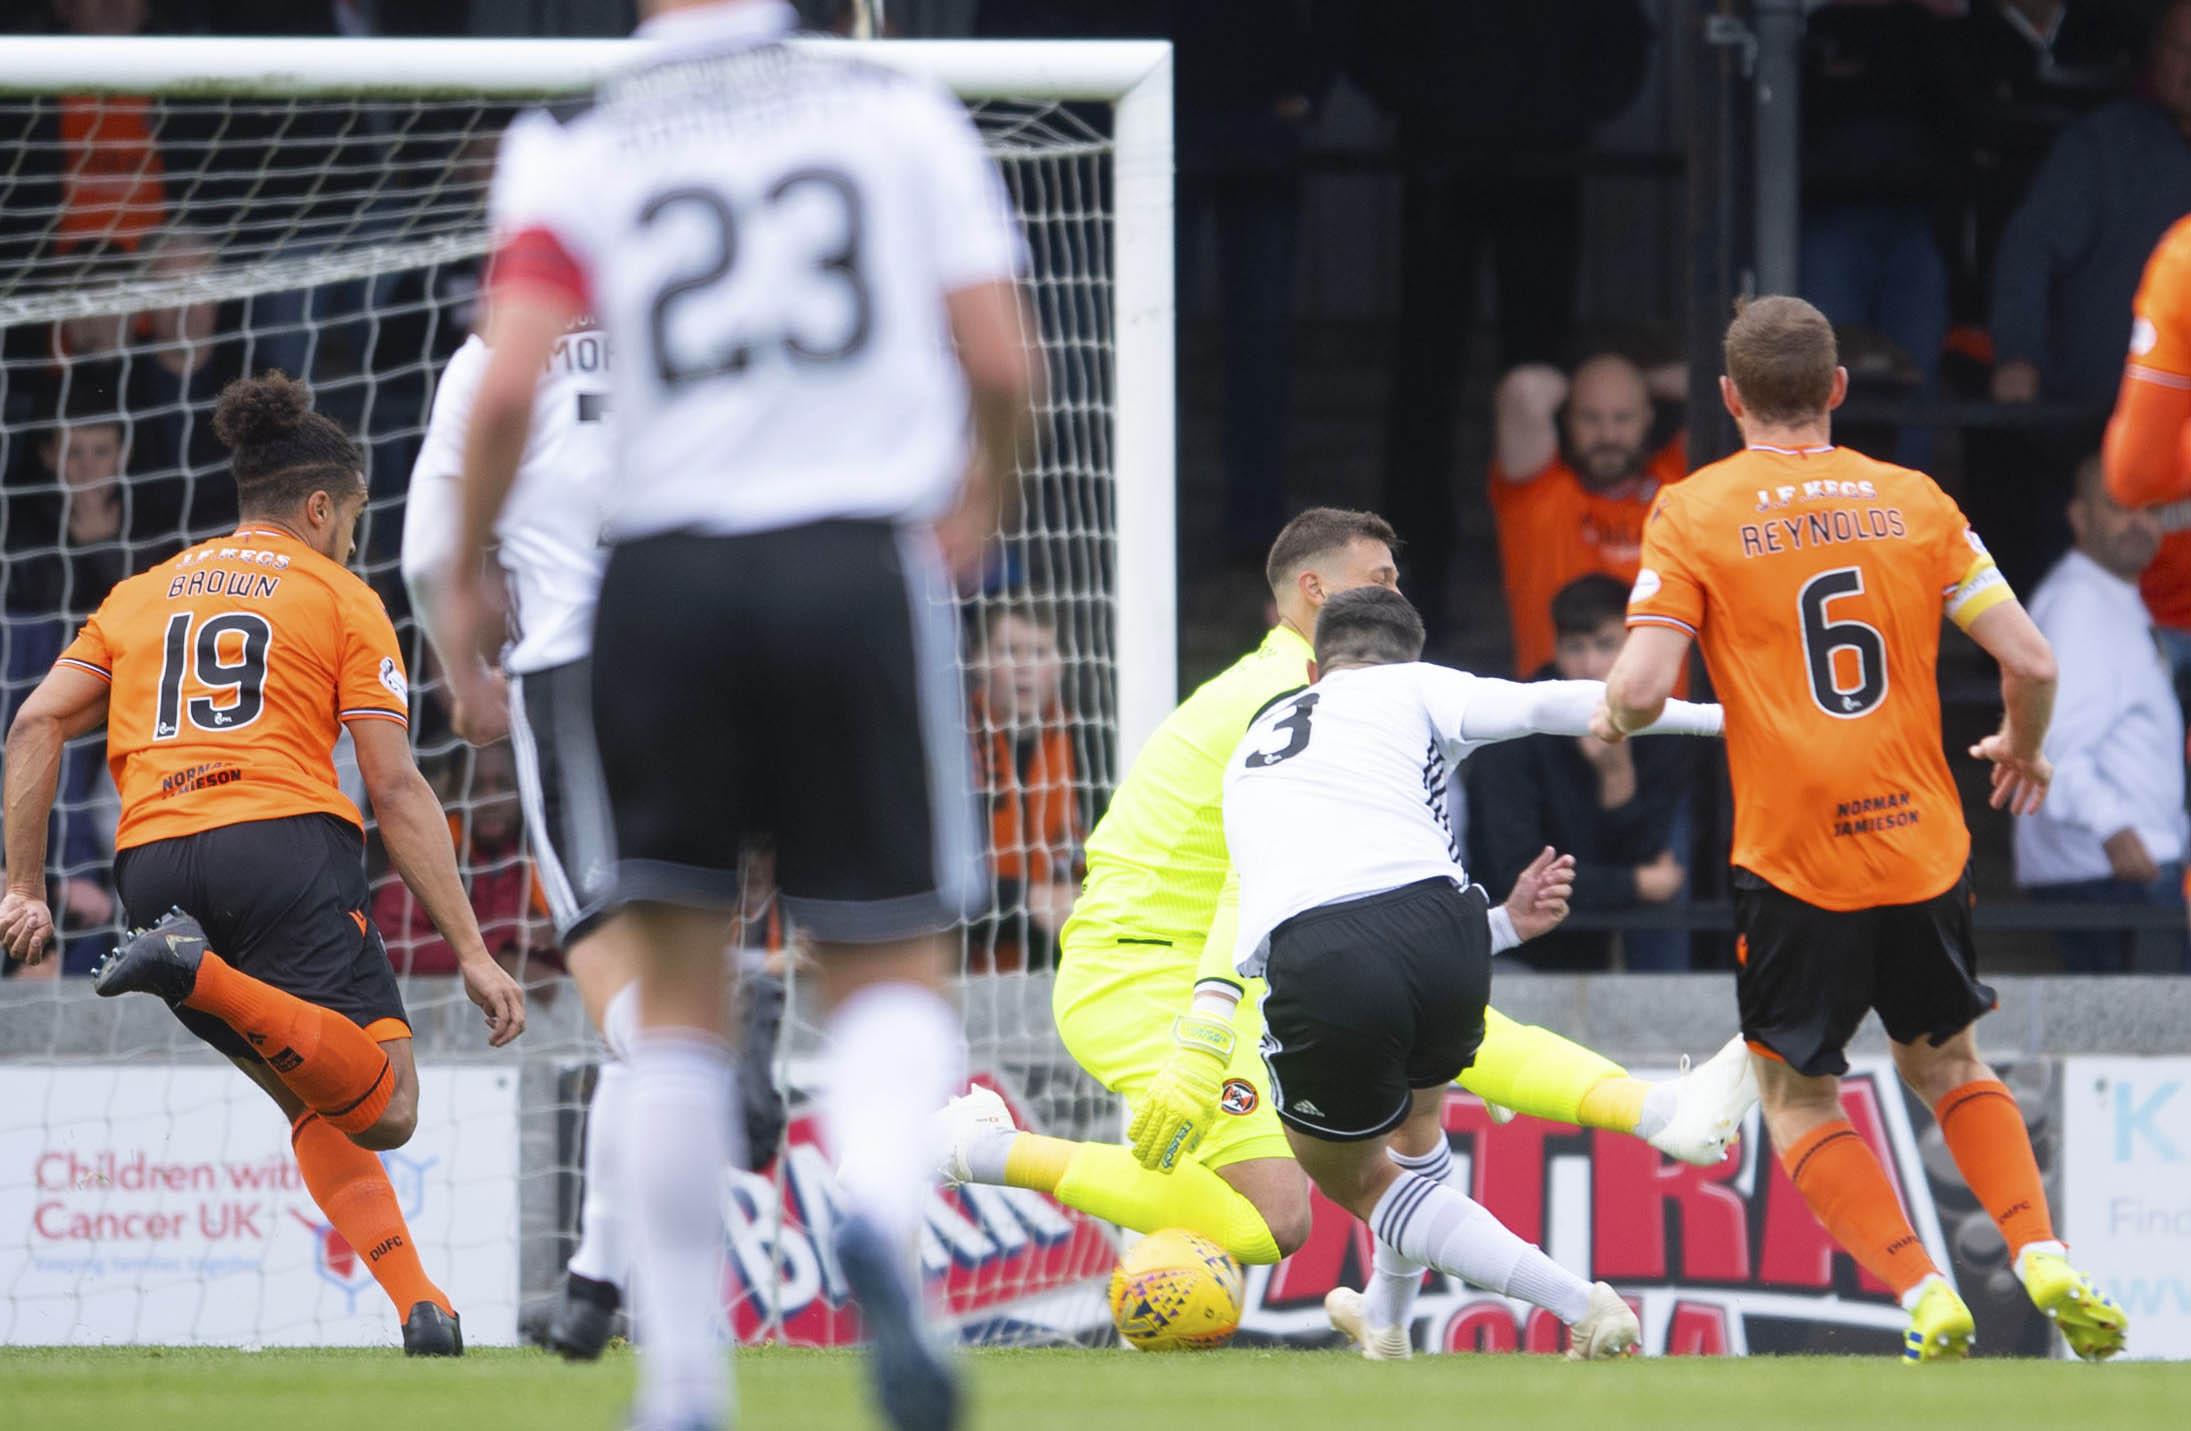 Daniel Harvie gave Ayr United the lead early on.